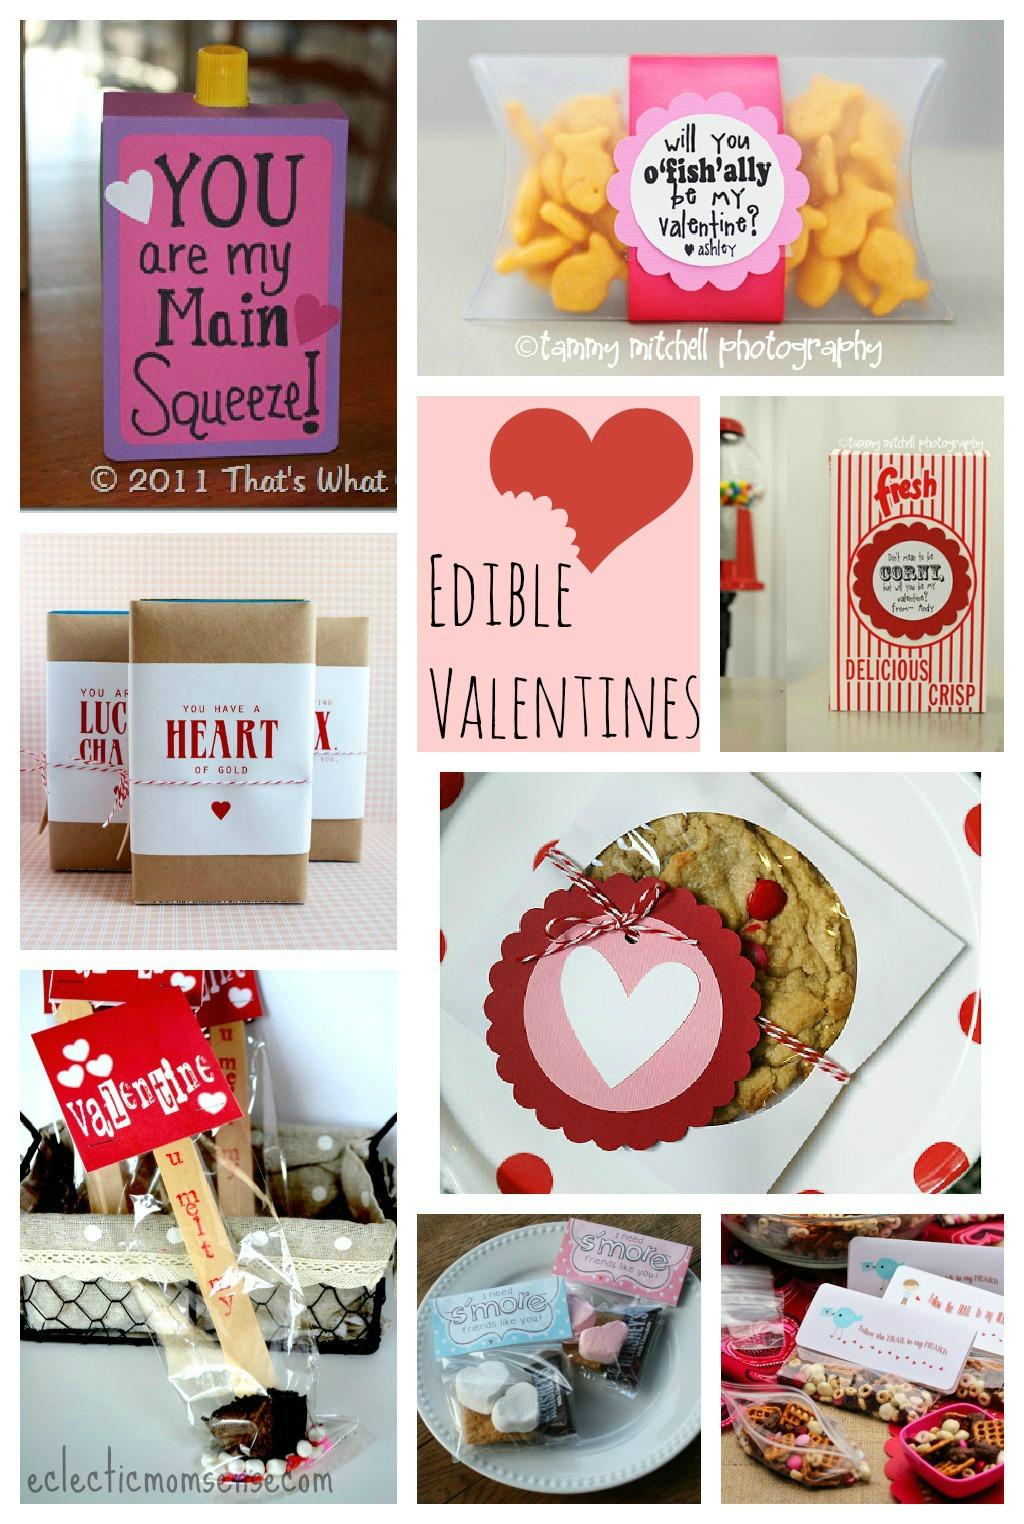 Edible Valentines Ideas via @eclecticmommy - eclecticmomsense.com